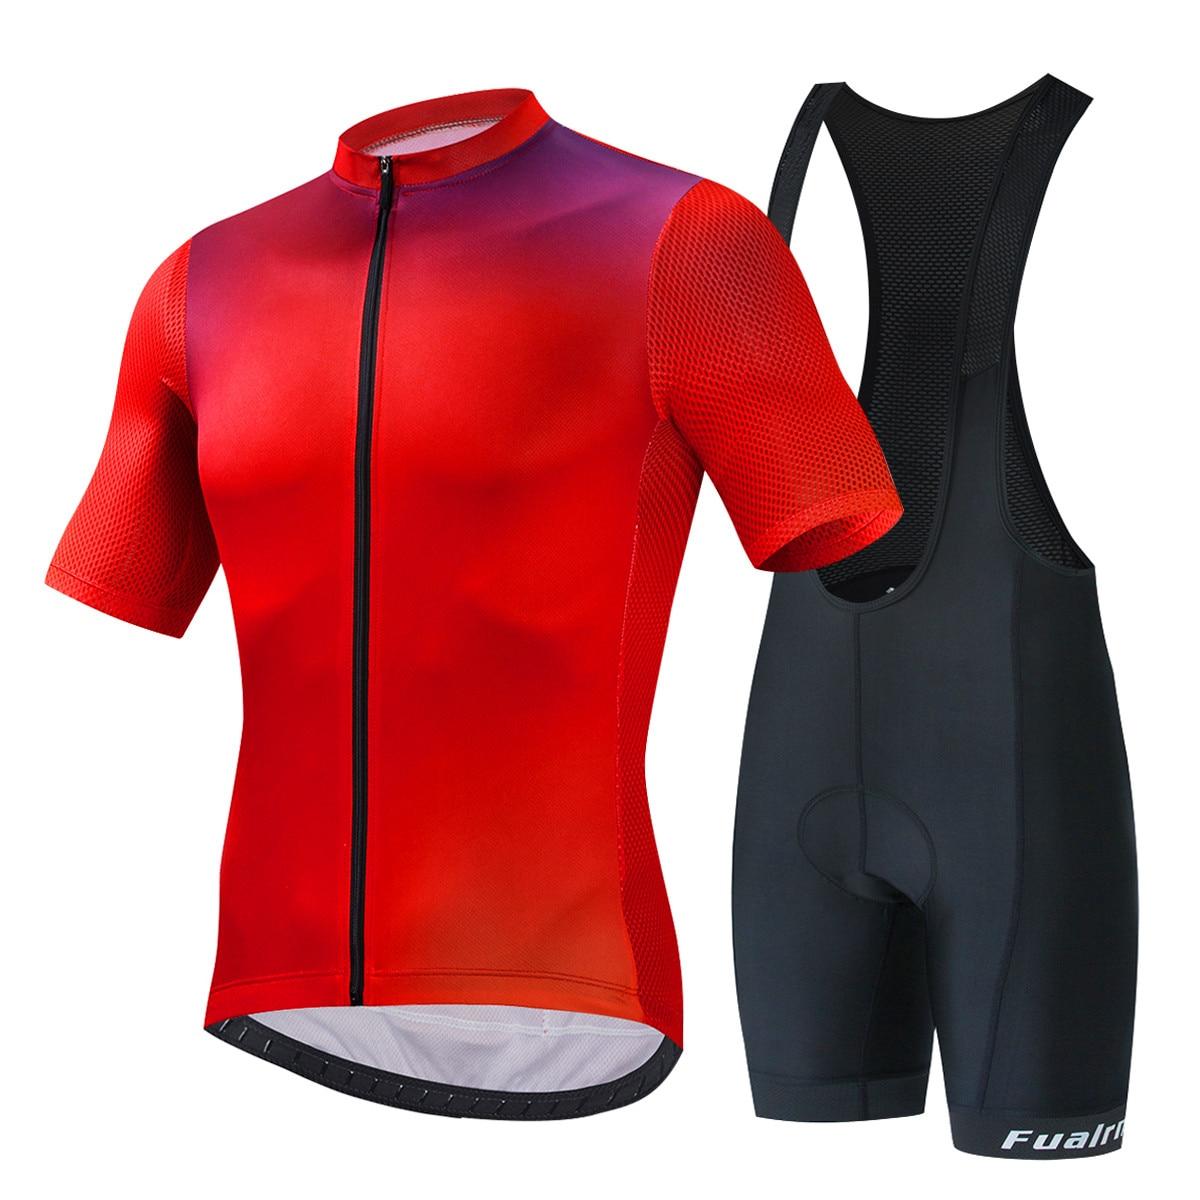 Fualrny pro conjunto camisa de ciclismo 100% poliéster mtb bicicleta roupas kit corrida roupas uniformes maillot ropa ciclismo